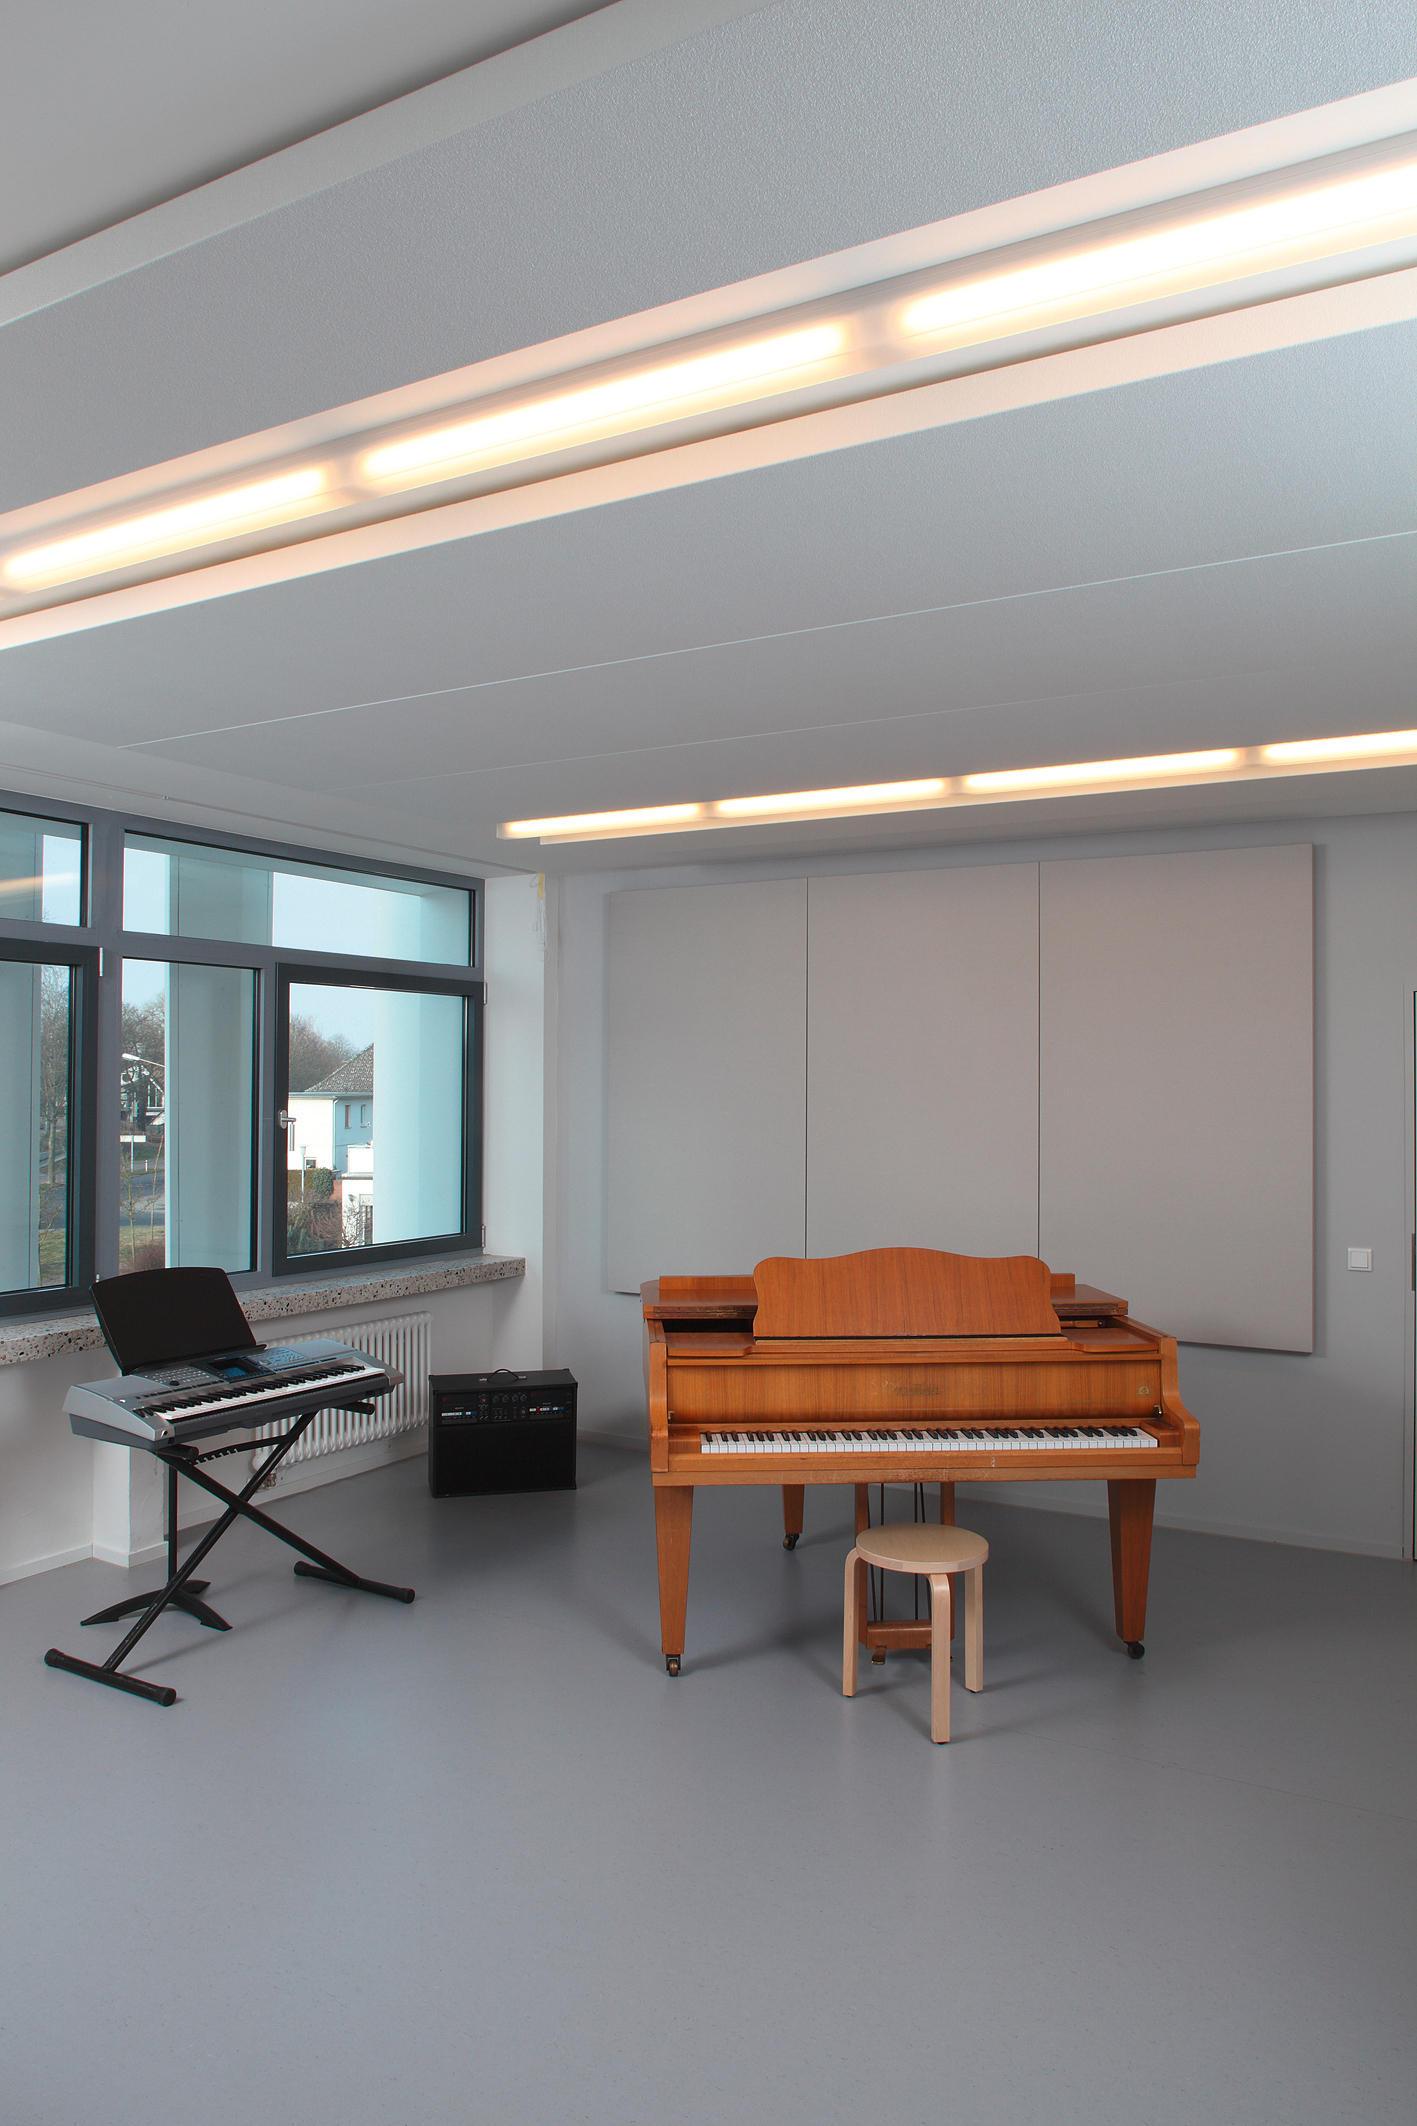 Innovative Holzpaneele Deckenmontage: Innovative Raumteiler